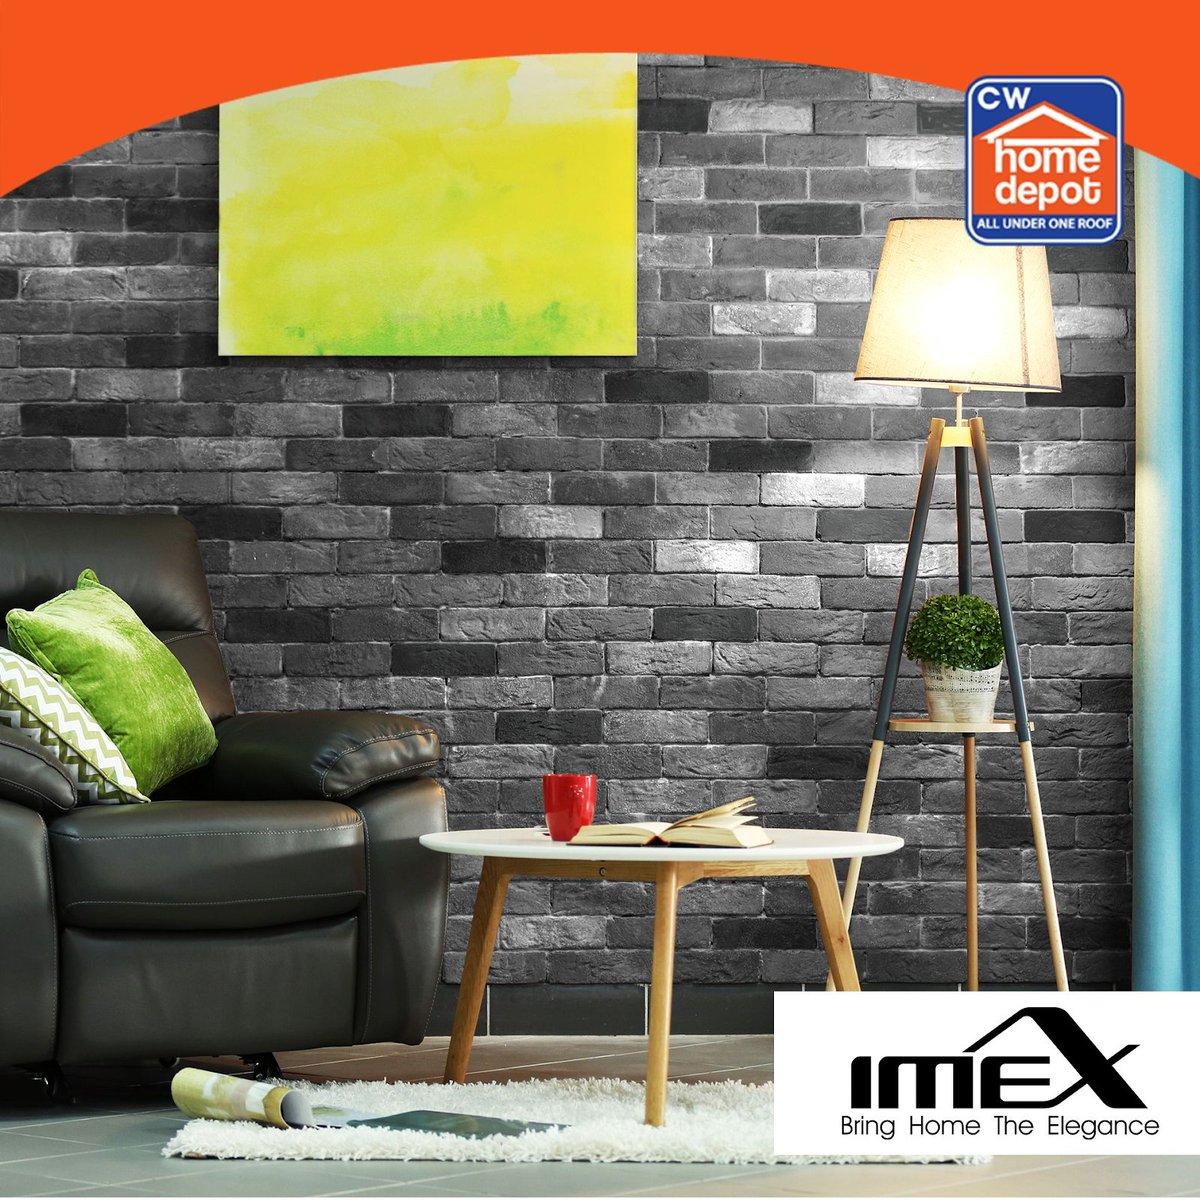 Best Living Room Decorating Ideas & Designs Ideas: Home Depot Room